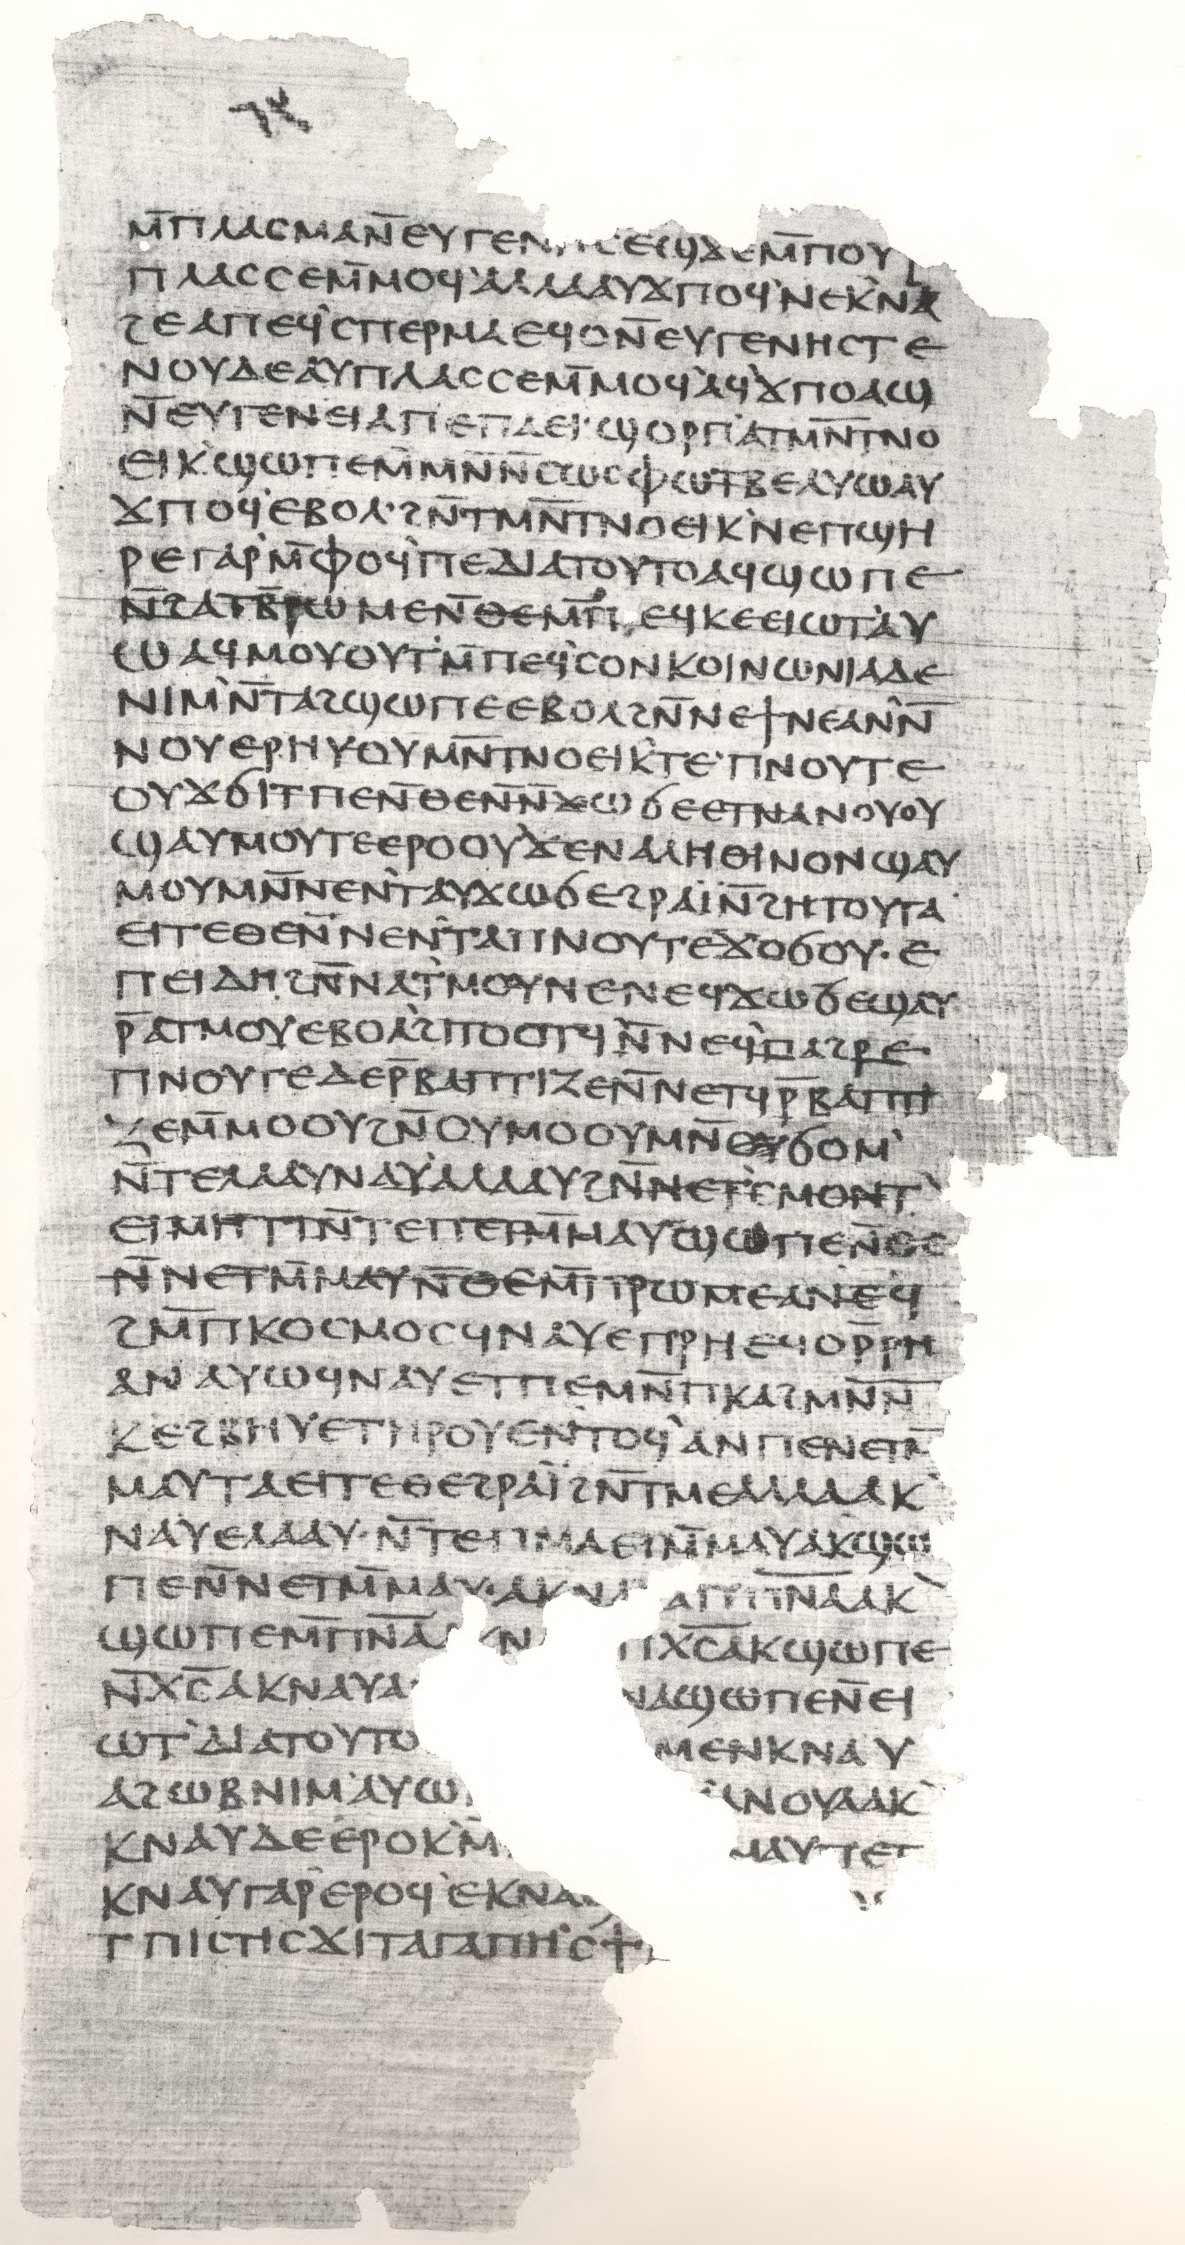 Gospel_of_Philip_facsimile_Page_61.jpg